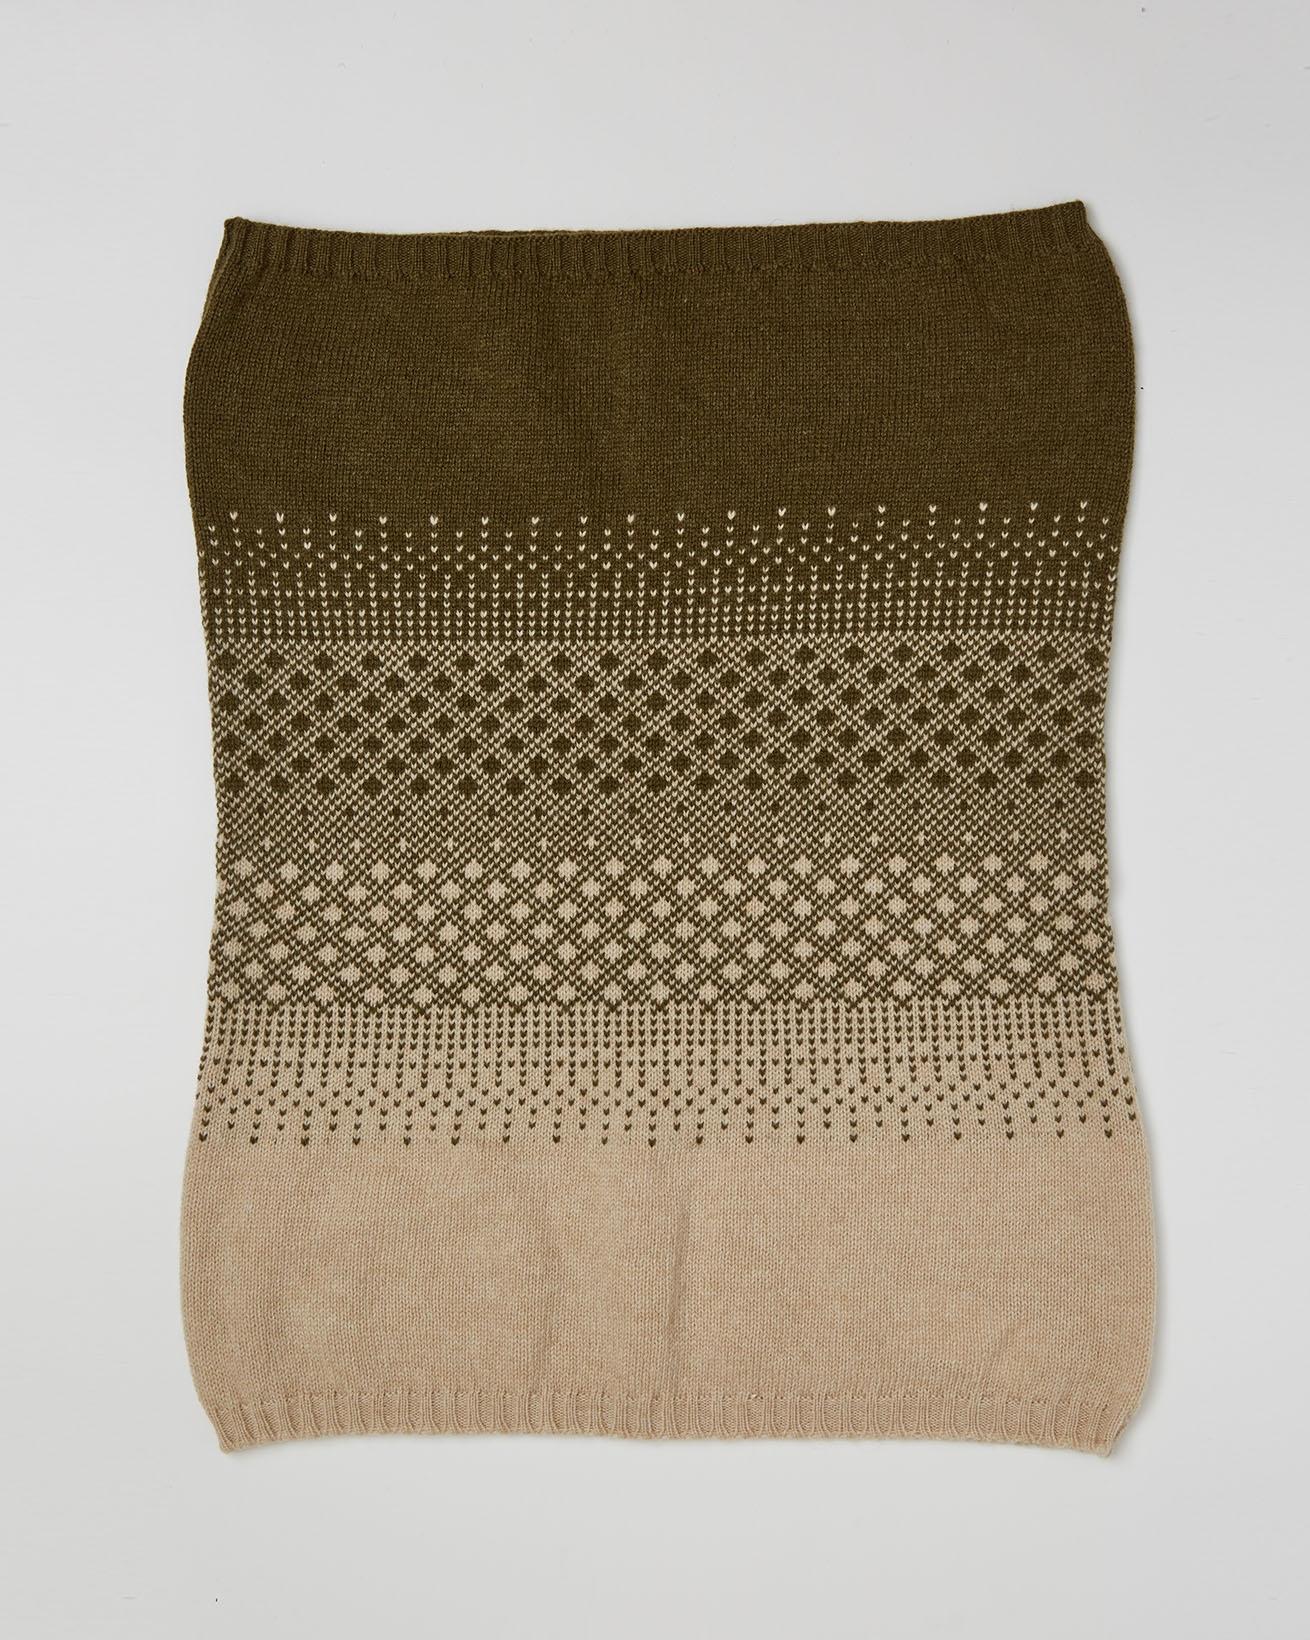 Cashmere Fairisle Snood - One Size - Olive, Camel - 2648